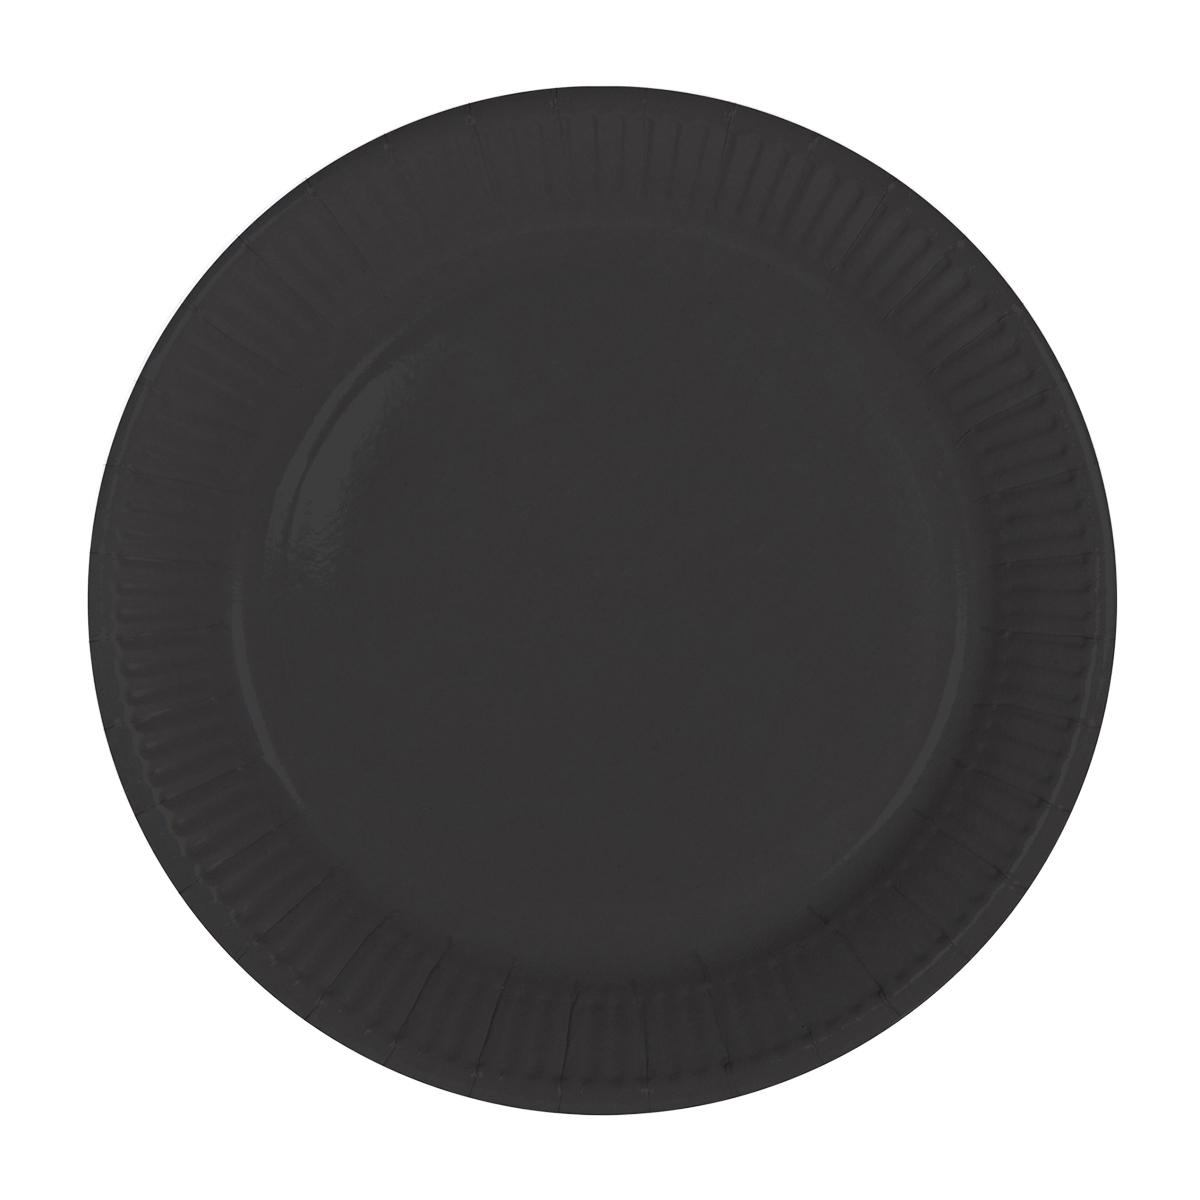 Tallrik, svart 8st